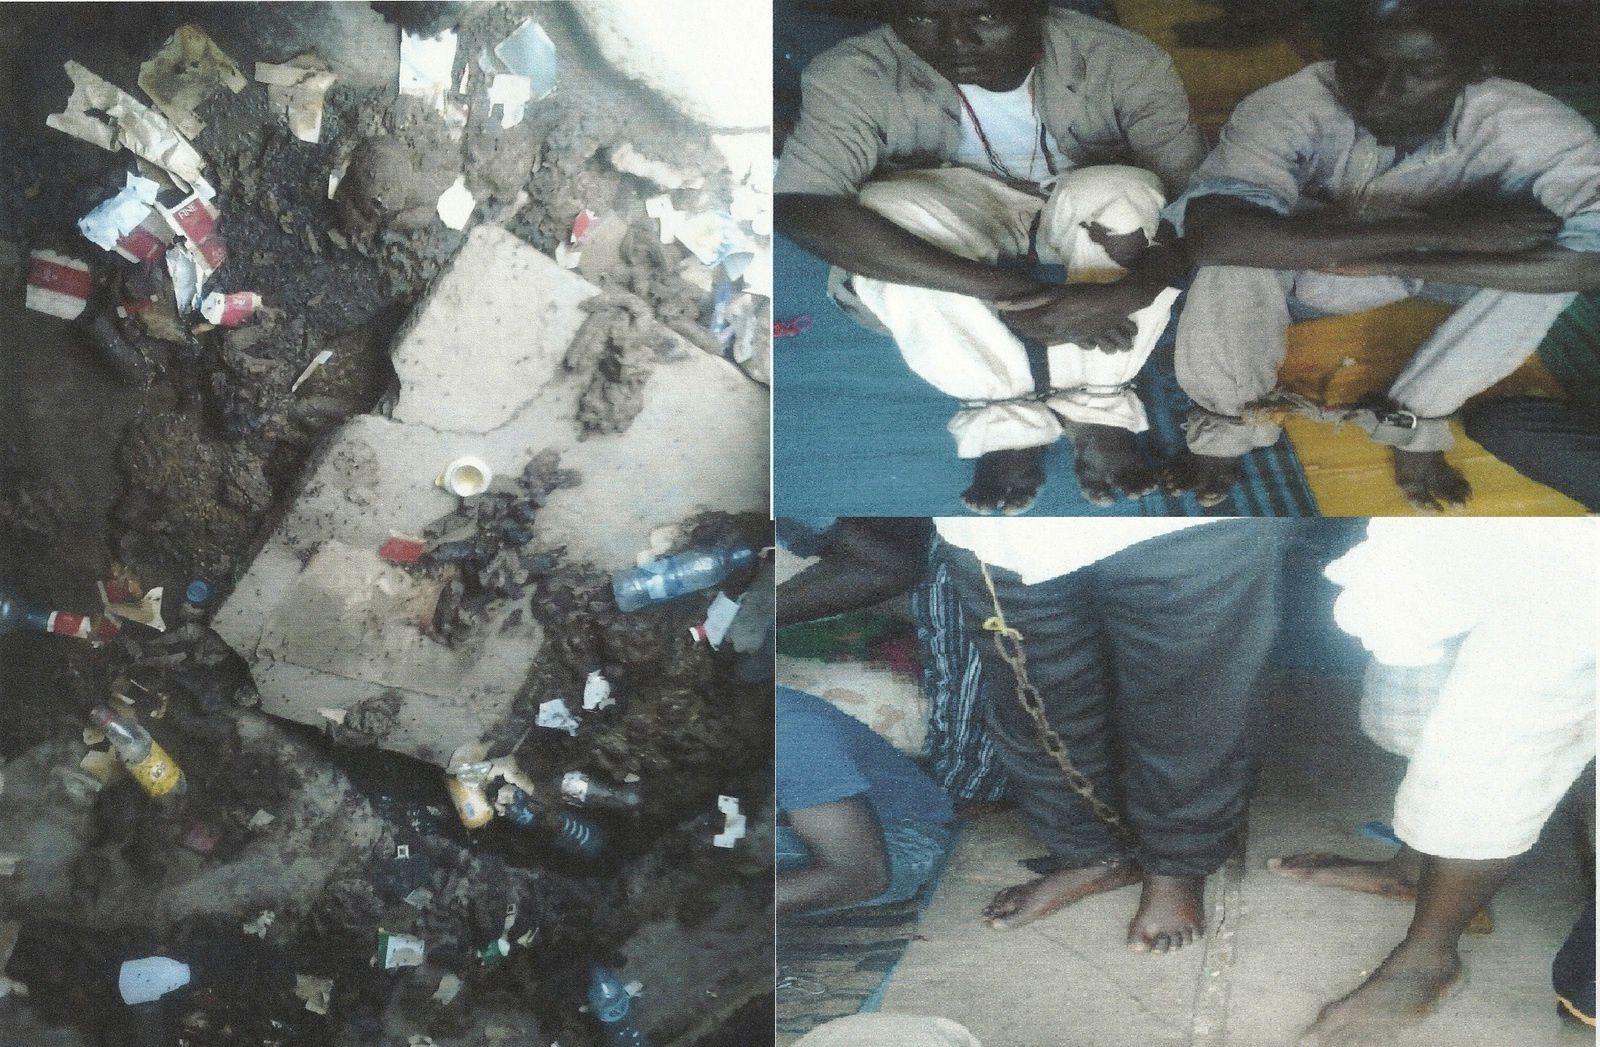 Rapport - CTDDH : situation éffroyable des droits humains au Tchad